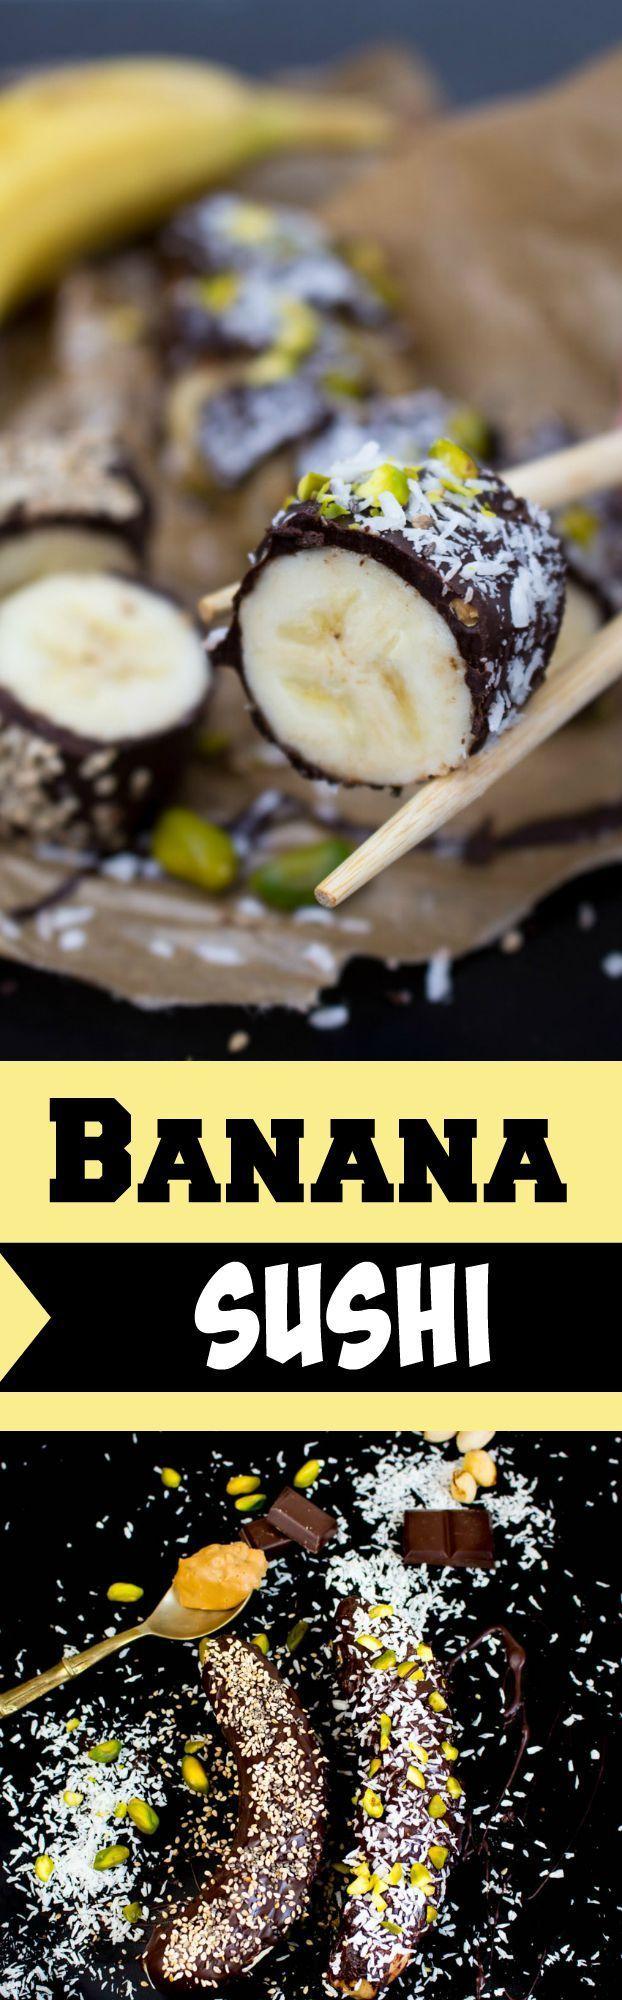 Super easy banana sushi with peanut butter, chocolate, coconut flakes, pistachios, sesame and chia seeds. So yummy! #vegan #sushi #bananasushi #chocolate